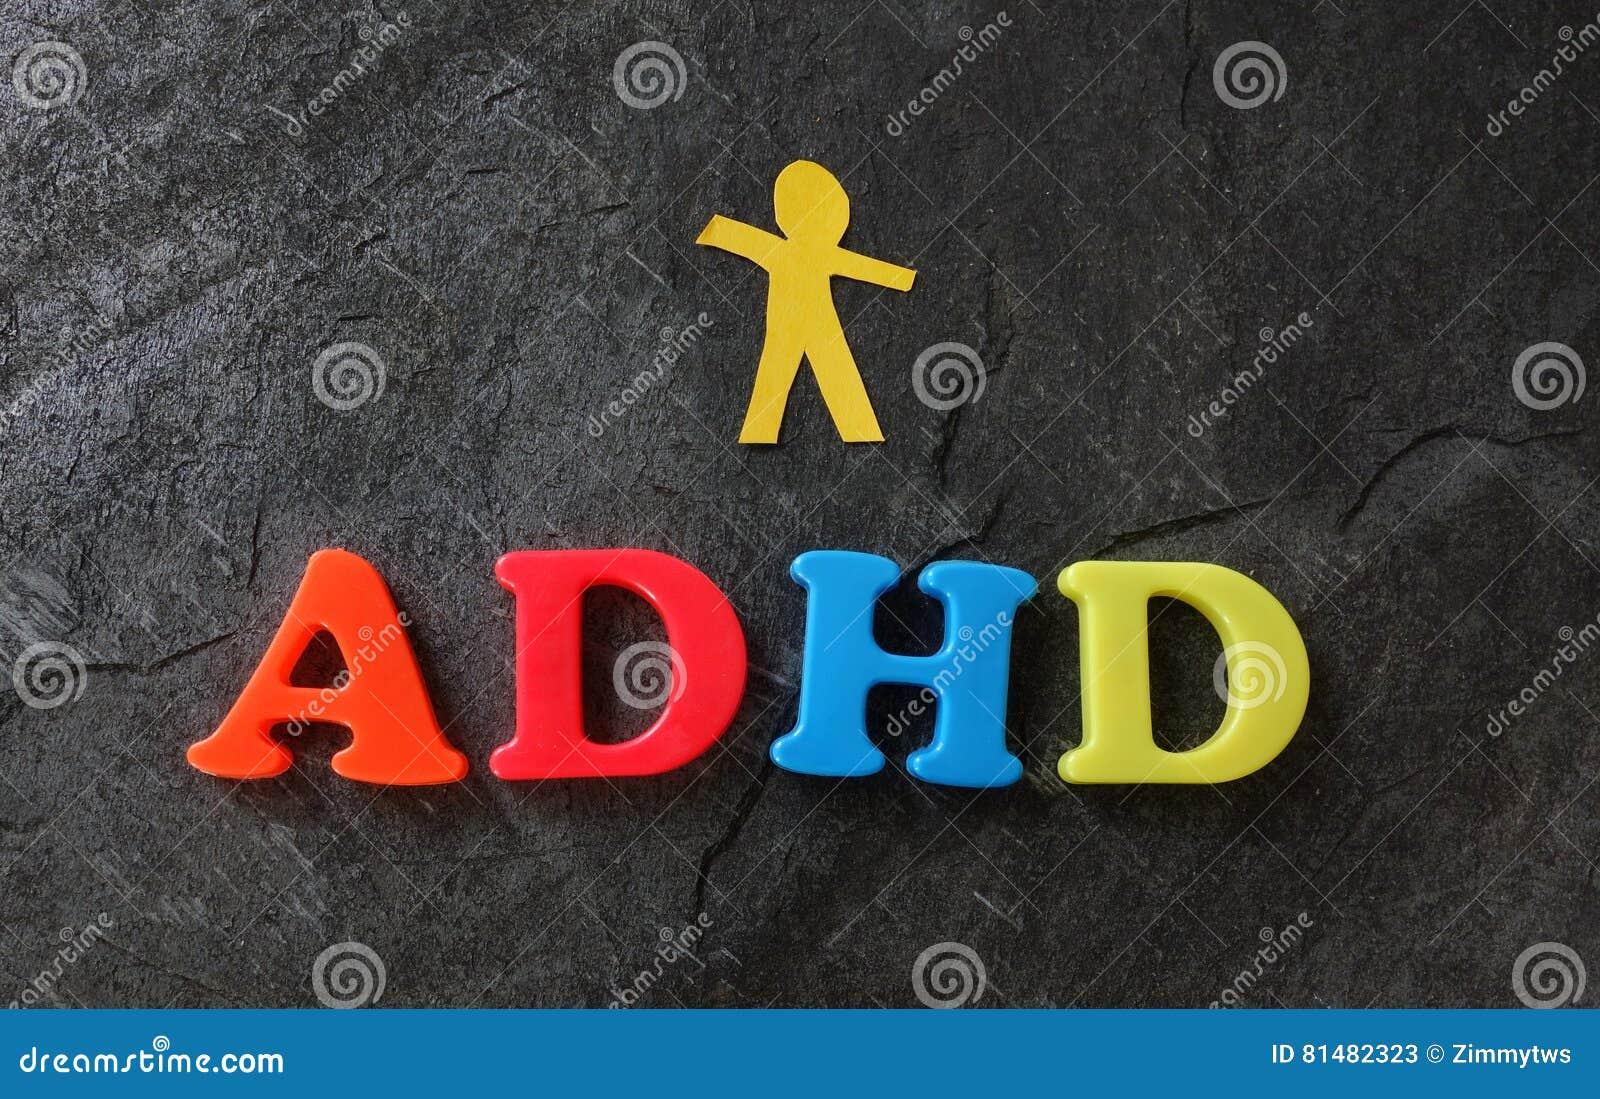 ADHD-pappersbarn